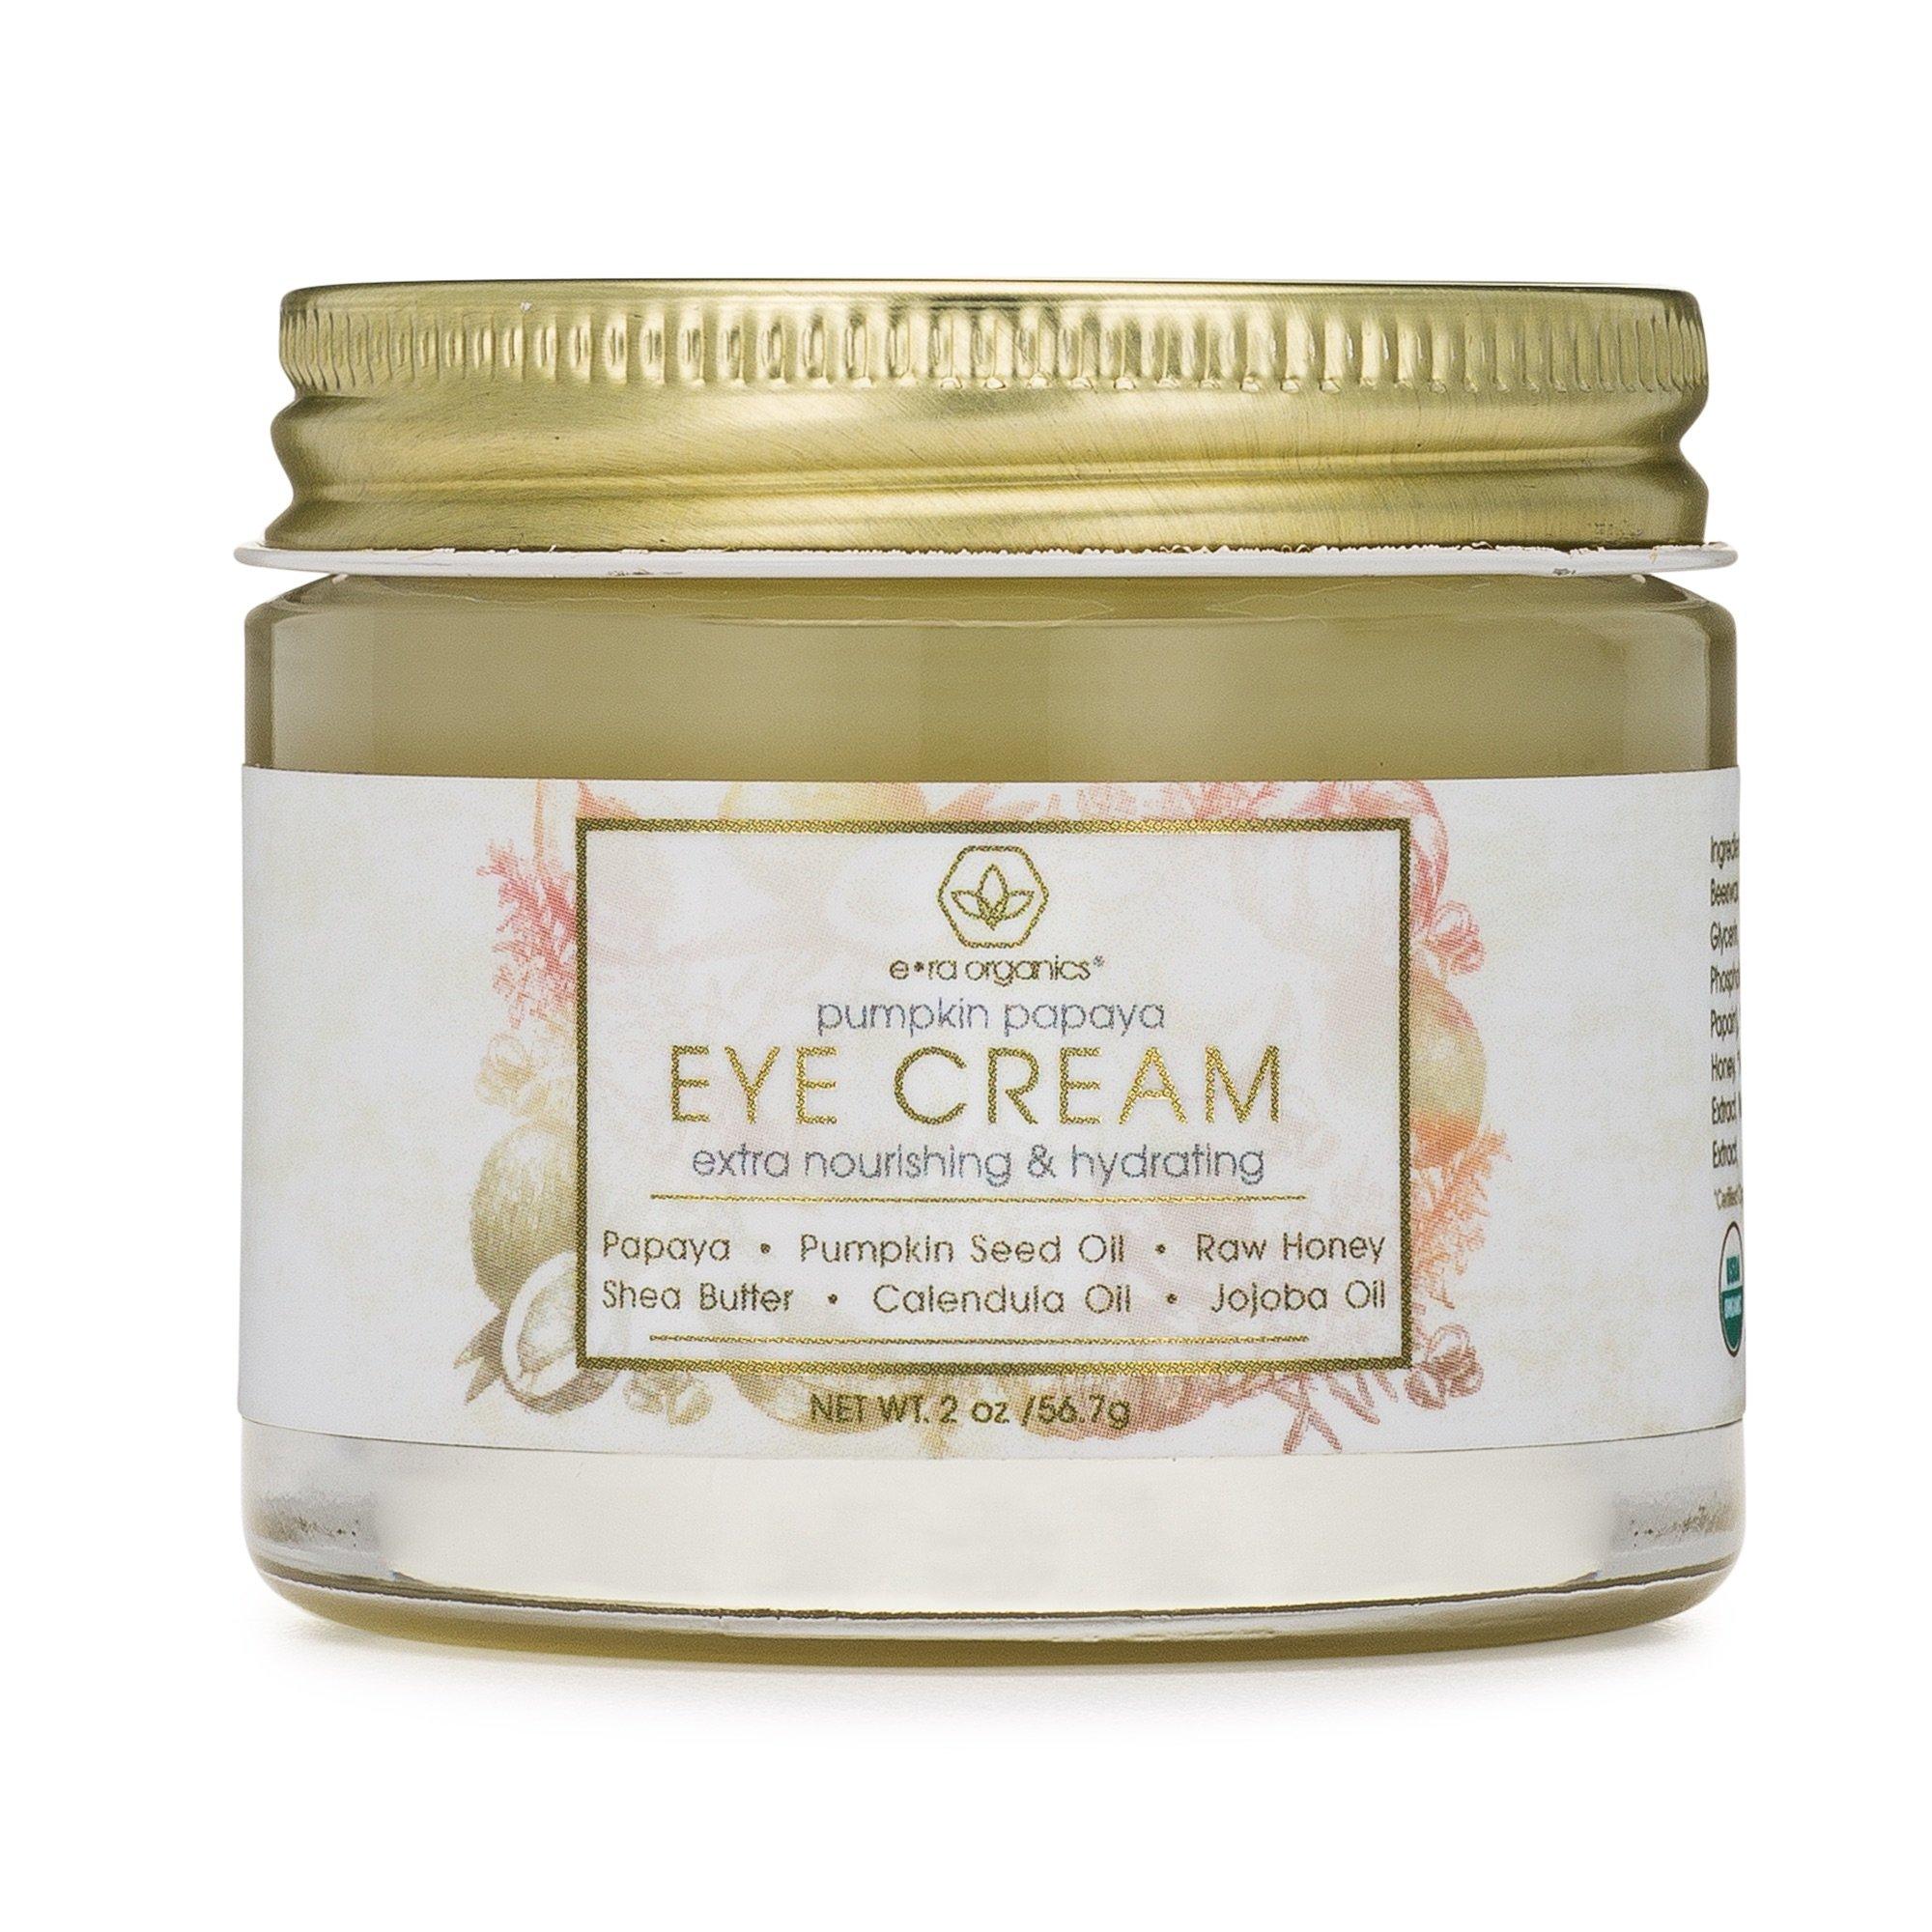 Buy Organic Eye Treatment Cream - Jojoba Oil Eye Cream - Smoother